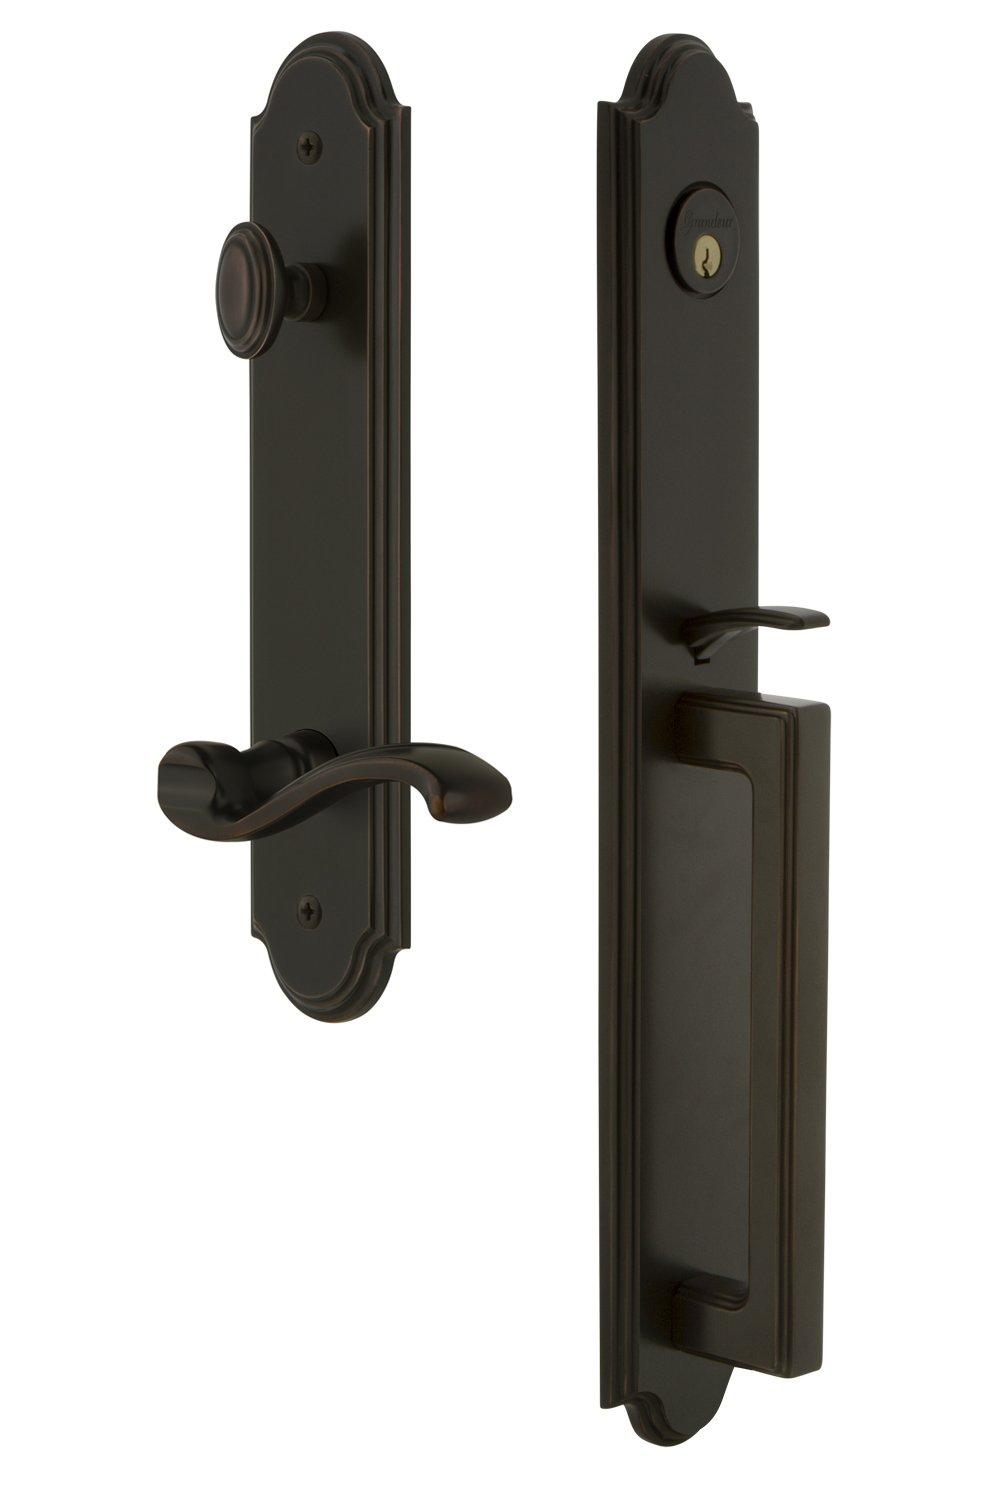 Single Cylinder Lock Backset Size-2.375 Grandeur Hardware Grandeur 847085 Hardware Arc One-Piece Handleset with D Grip and Portofino Lever in Satin Nickel Backset Size-2.375